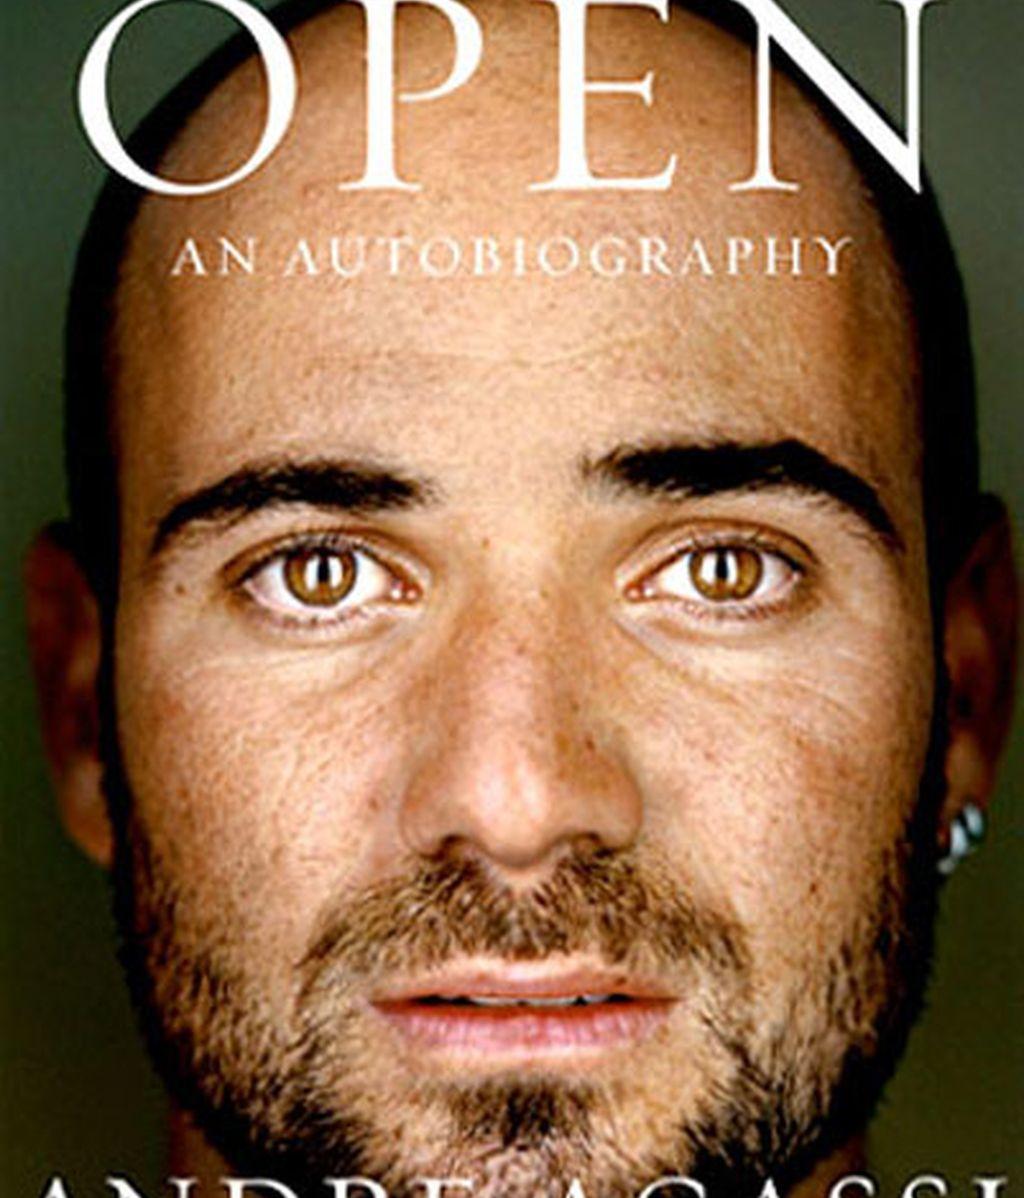 Open, la biografía-escándalo de Andrés Agassi